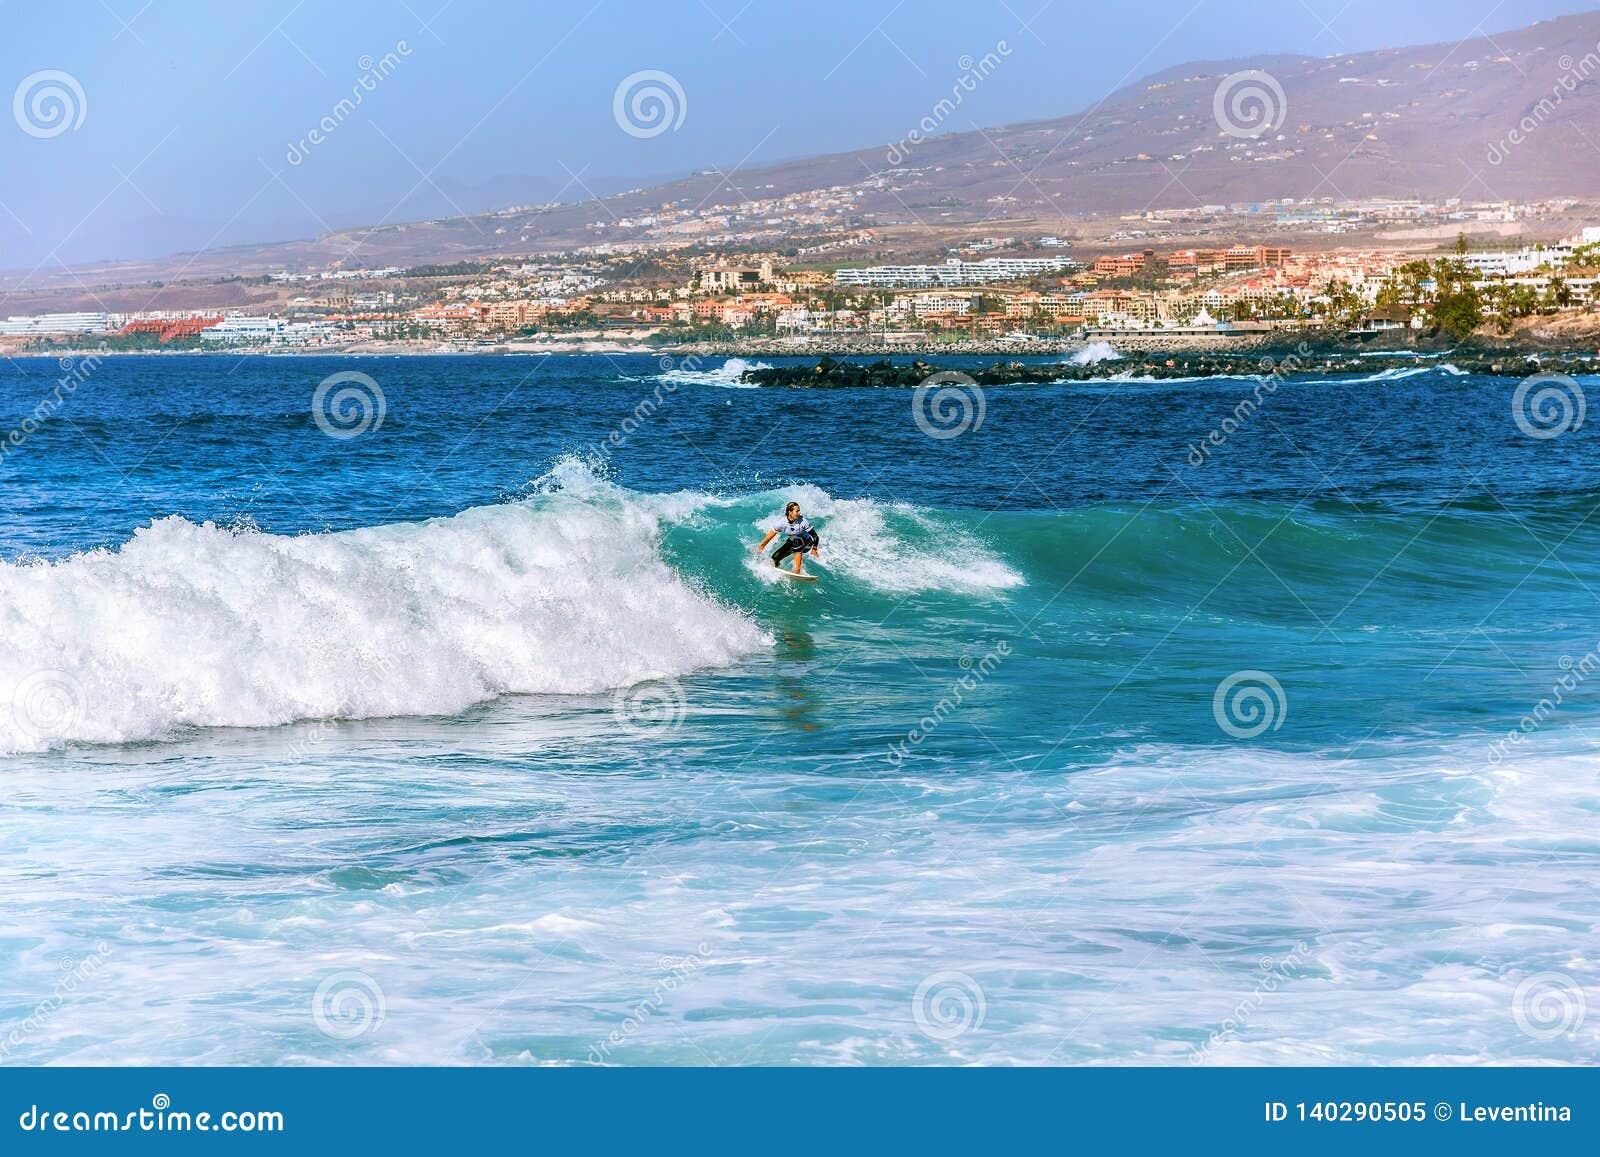 Surfer girl in Costa Adeje on Tenerife